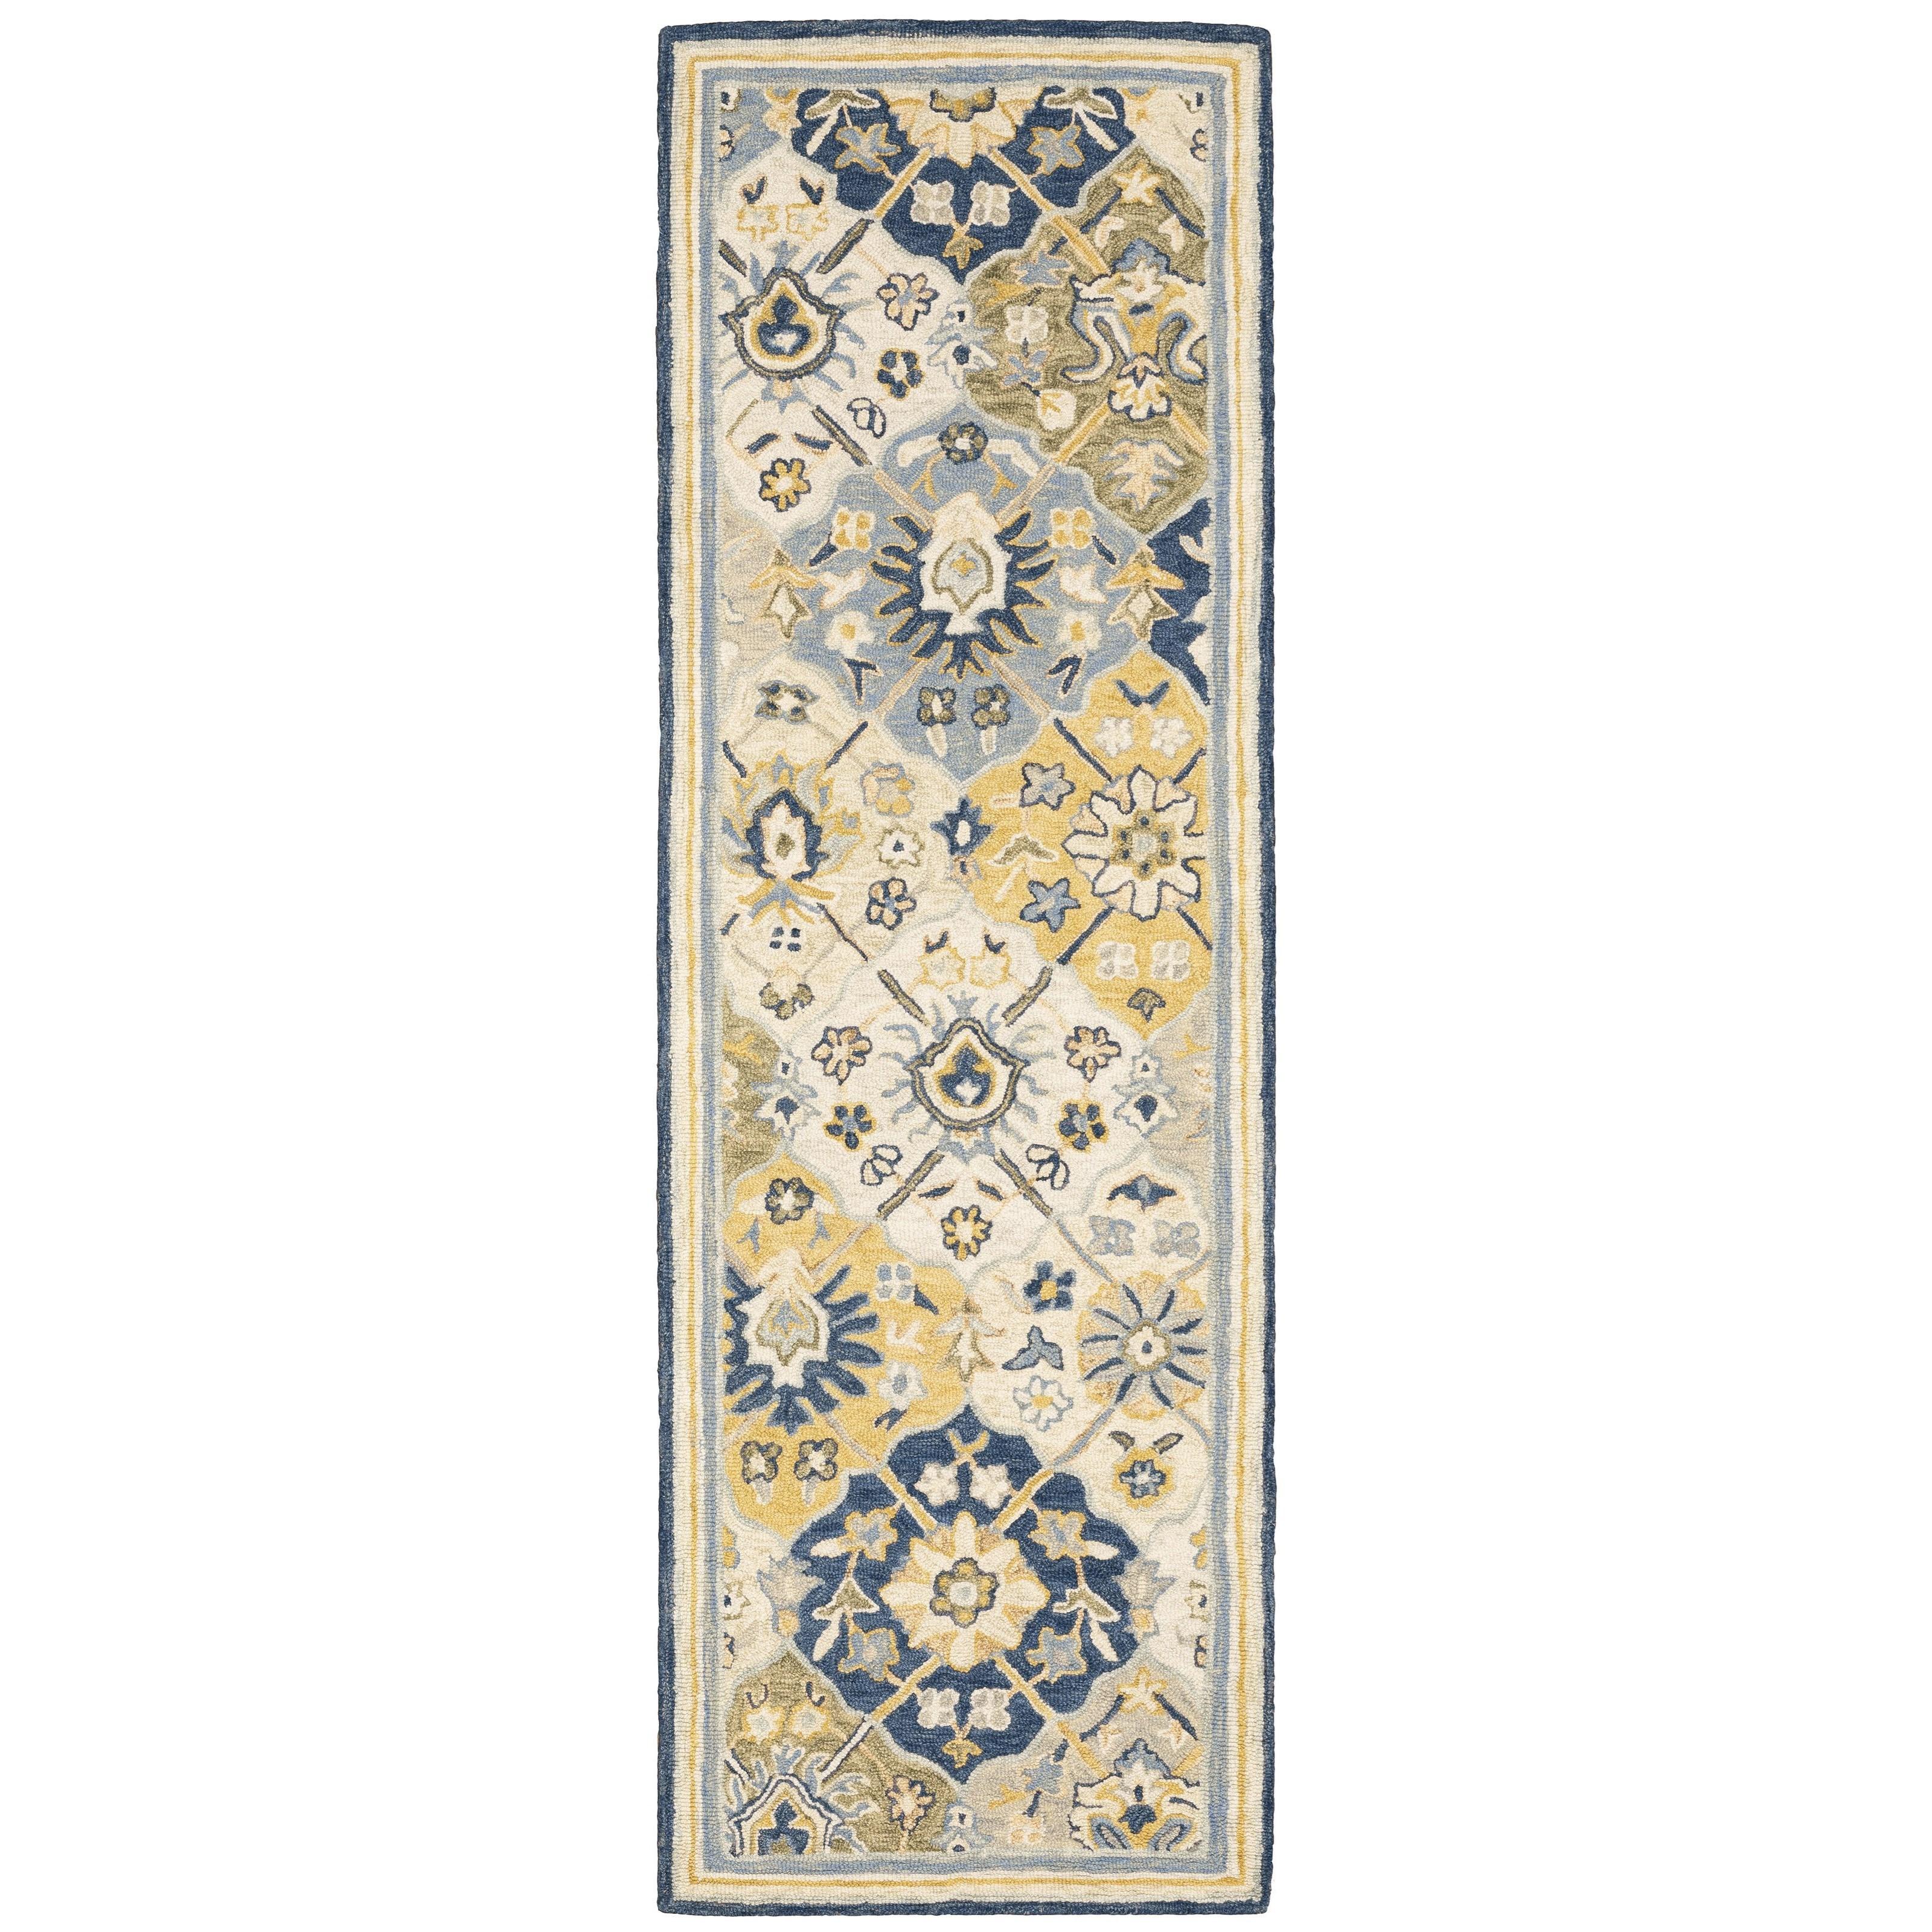 "Alfresco 2' 6"" X  8' Runner Rug by Oriental Weavers at Steger's Furniture"